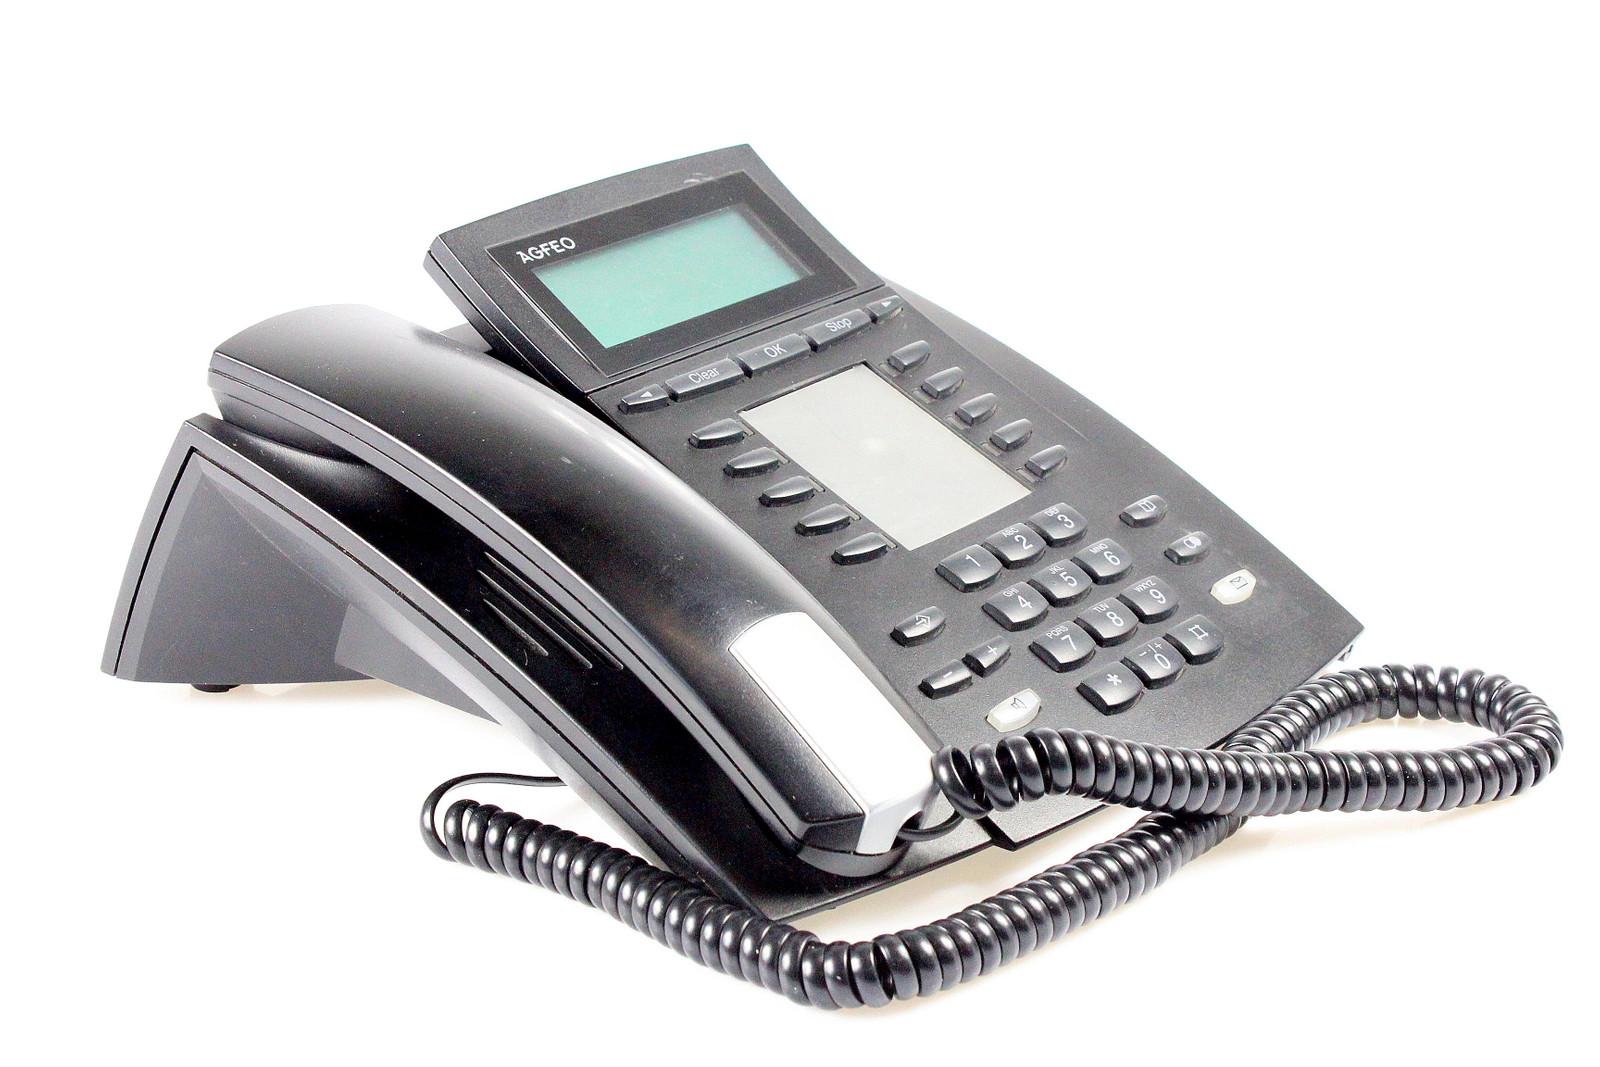 S0 Systemtelefon schwarz // inkl MwSt. Agfeo ST 40